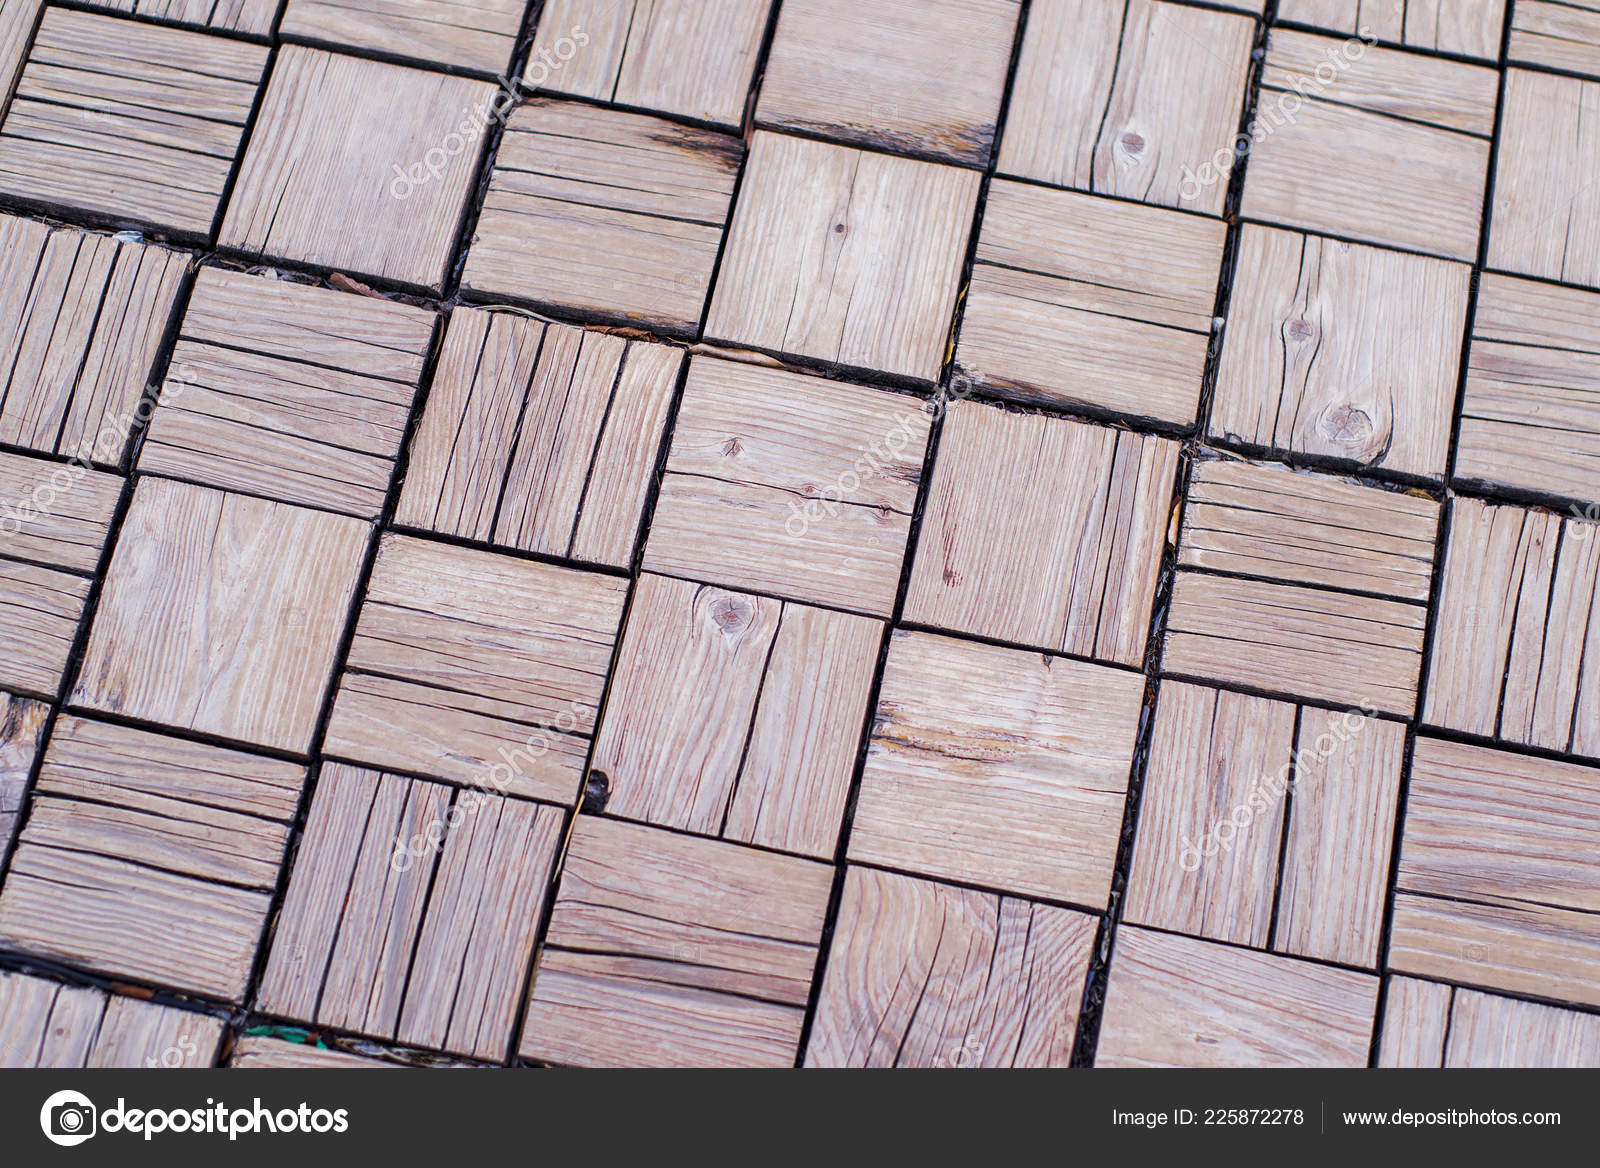 Imitation Wood Paving Tiles Imitation Wood Stock Photo Nkooume